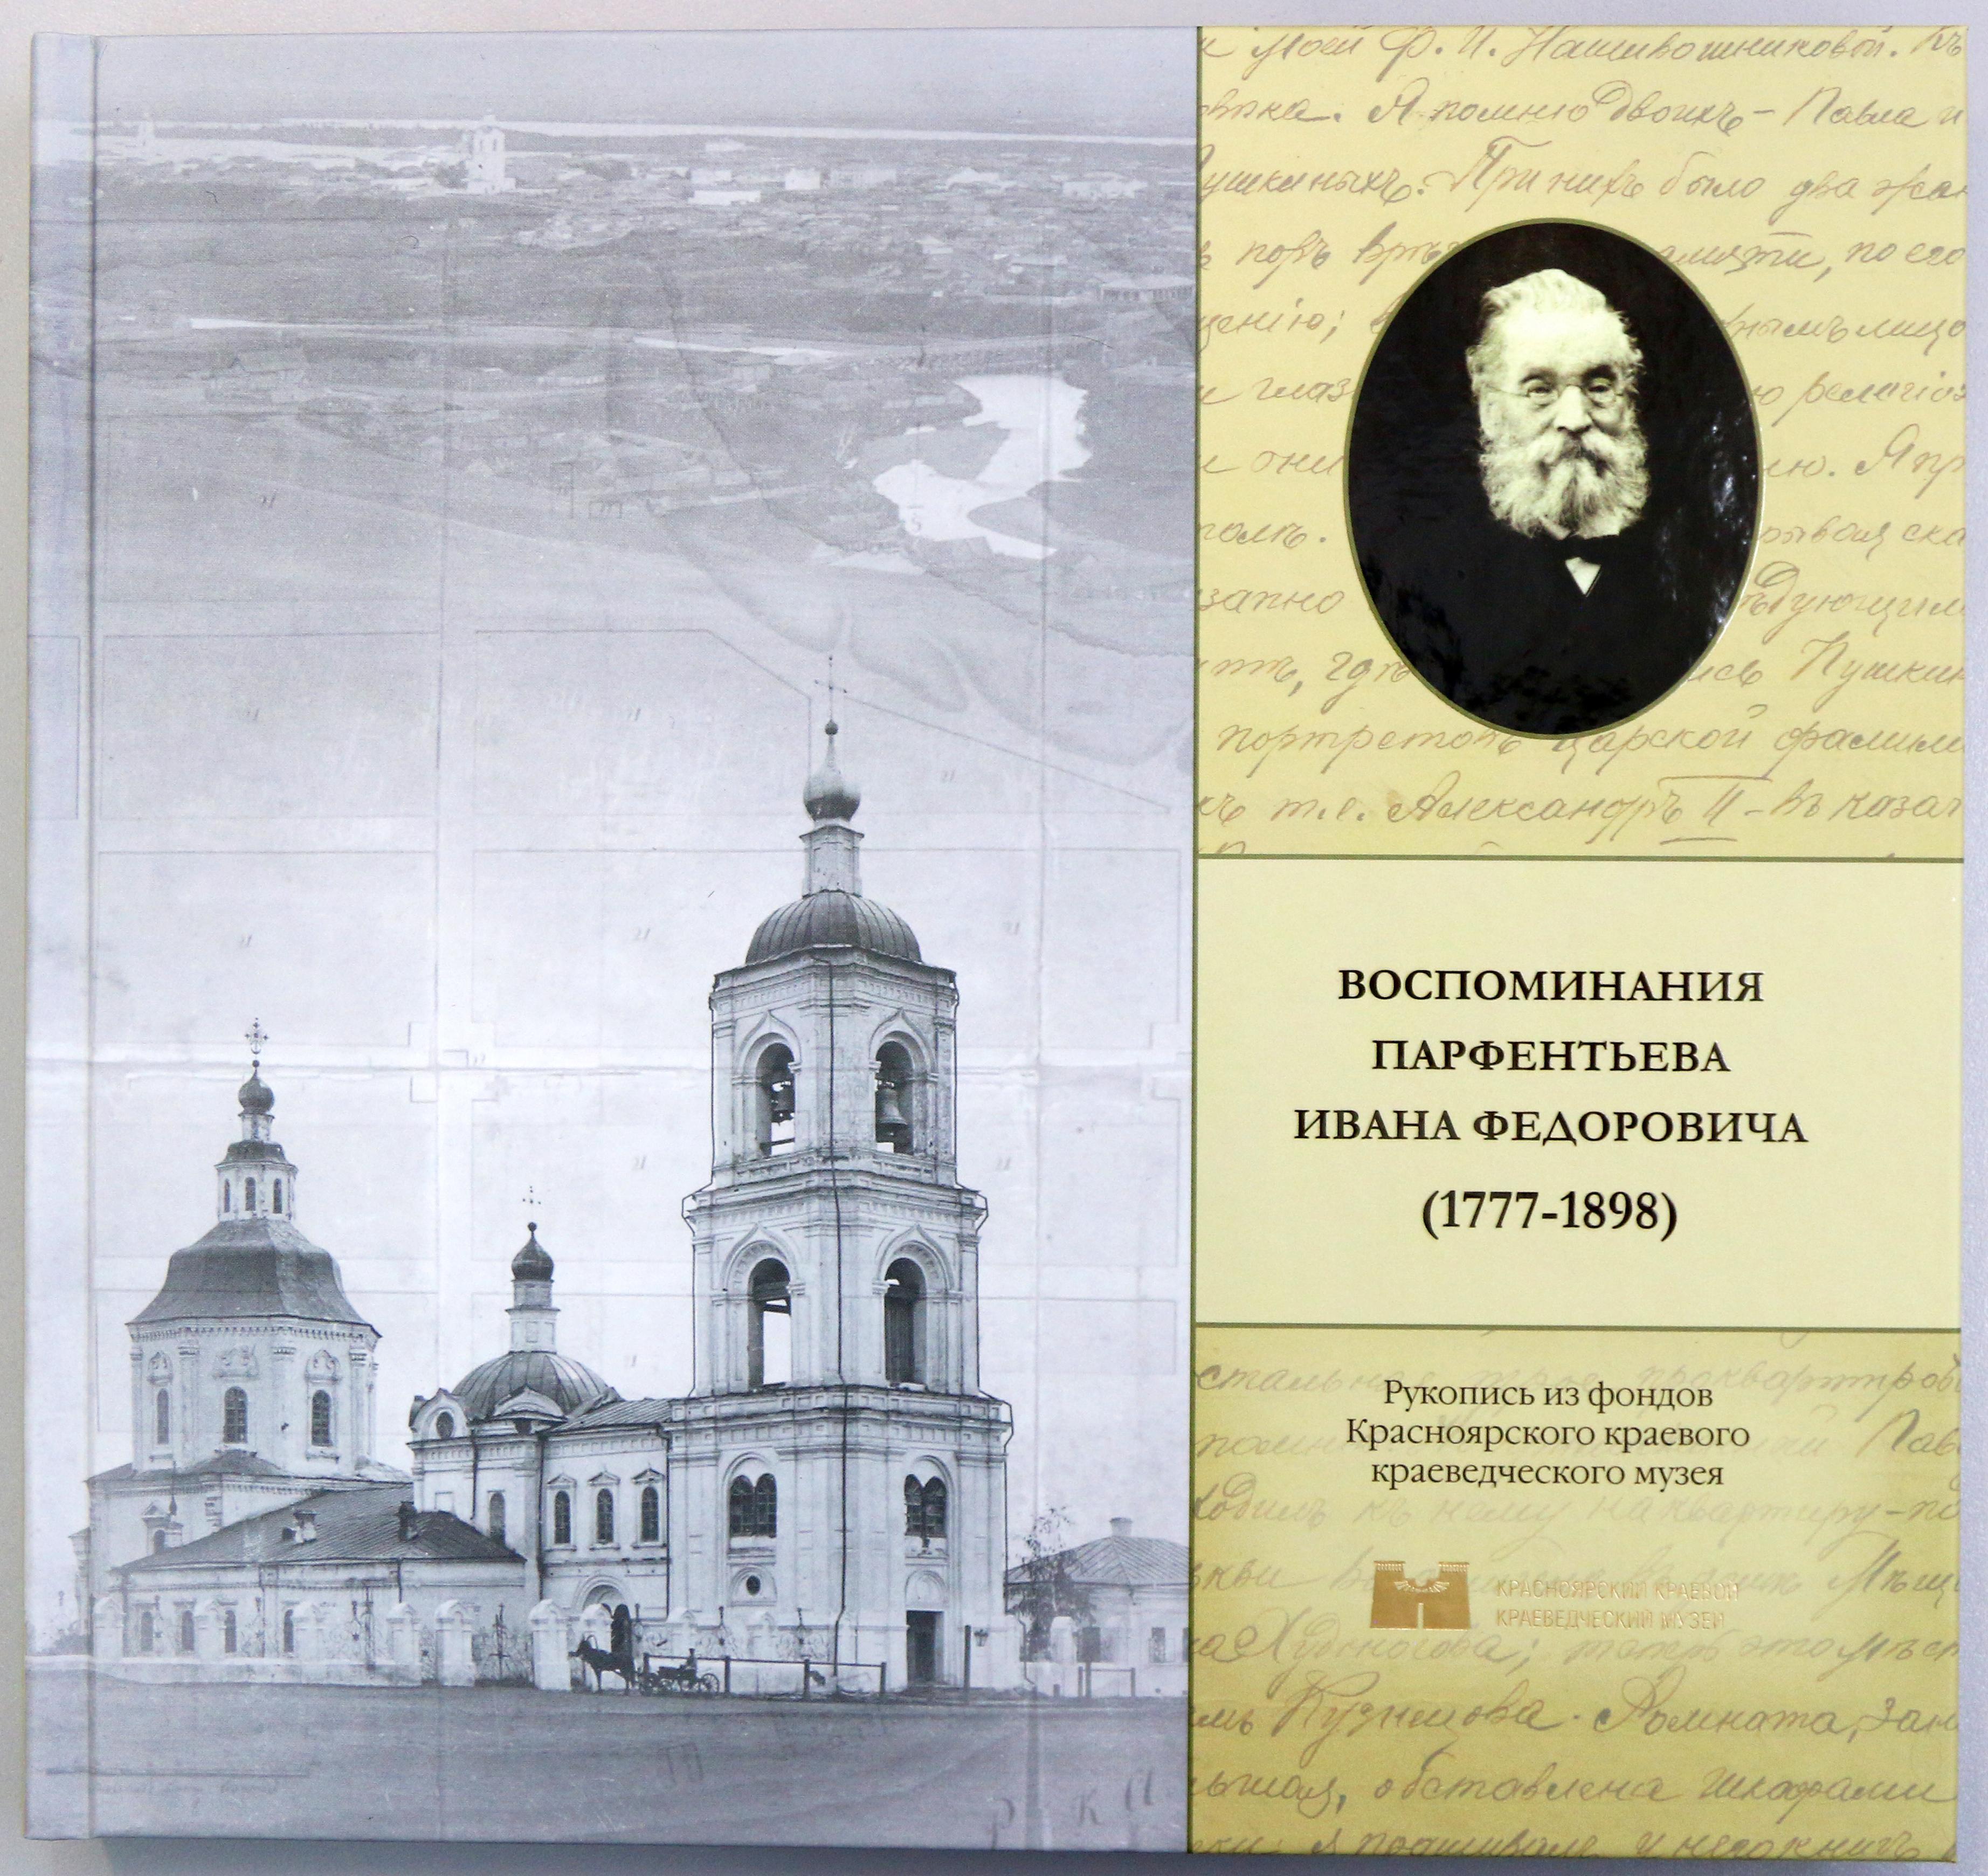 IMG_9151 Красноярский краеведческий музей выпустил книгу о жизни в Красноярске XIX века